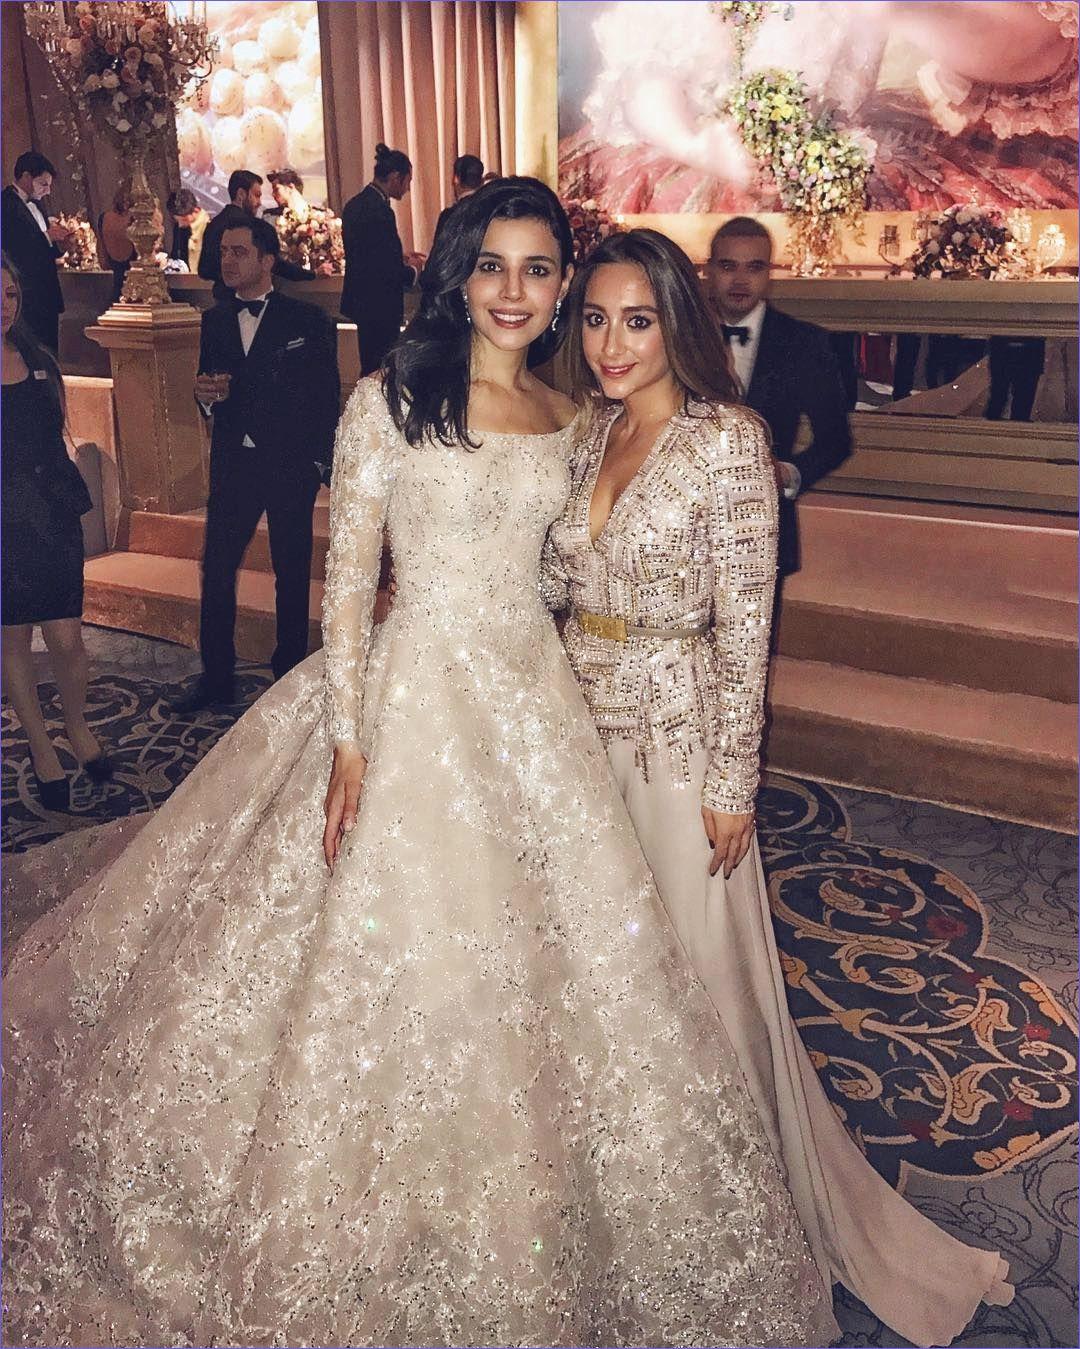 This turkish bride s wedding dress looks like a work of art just